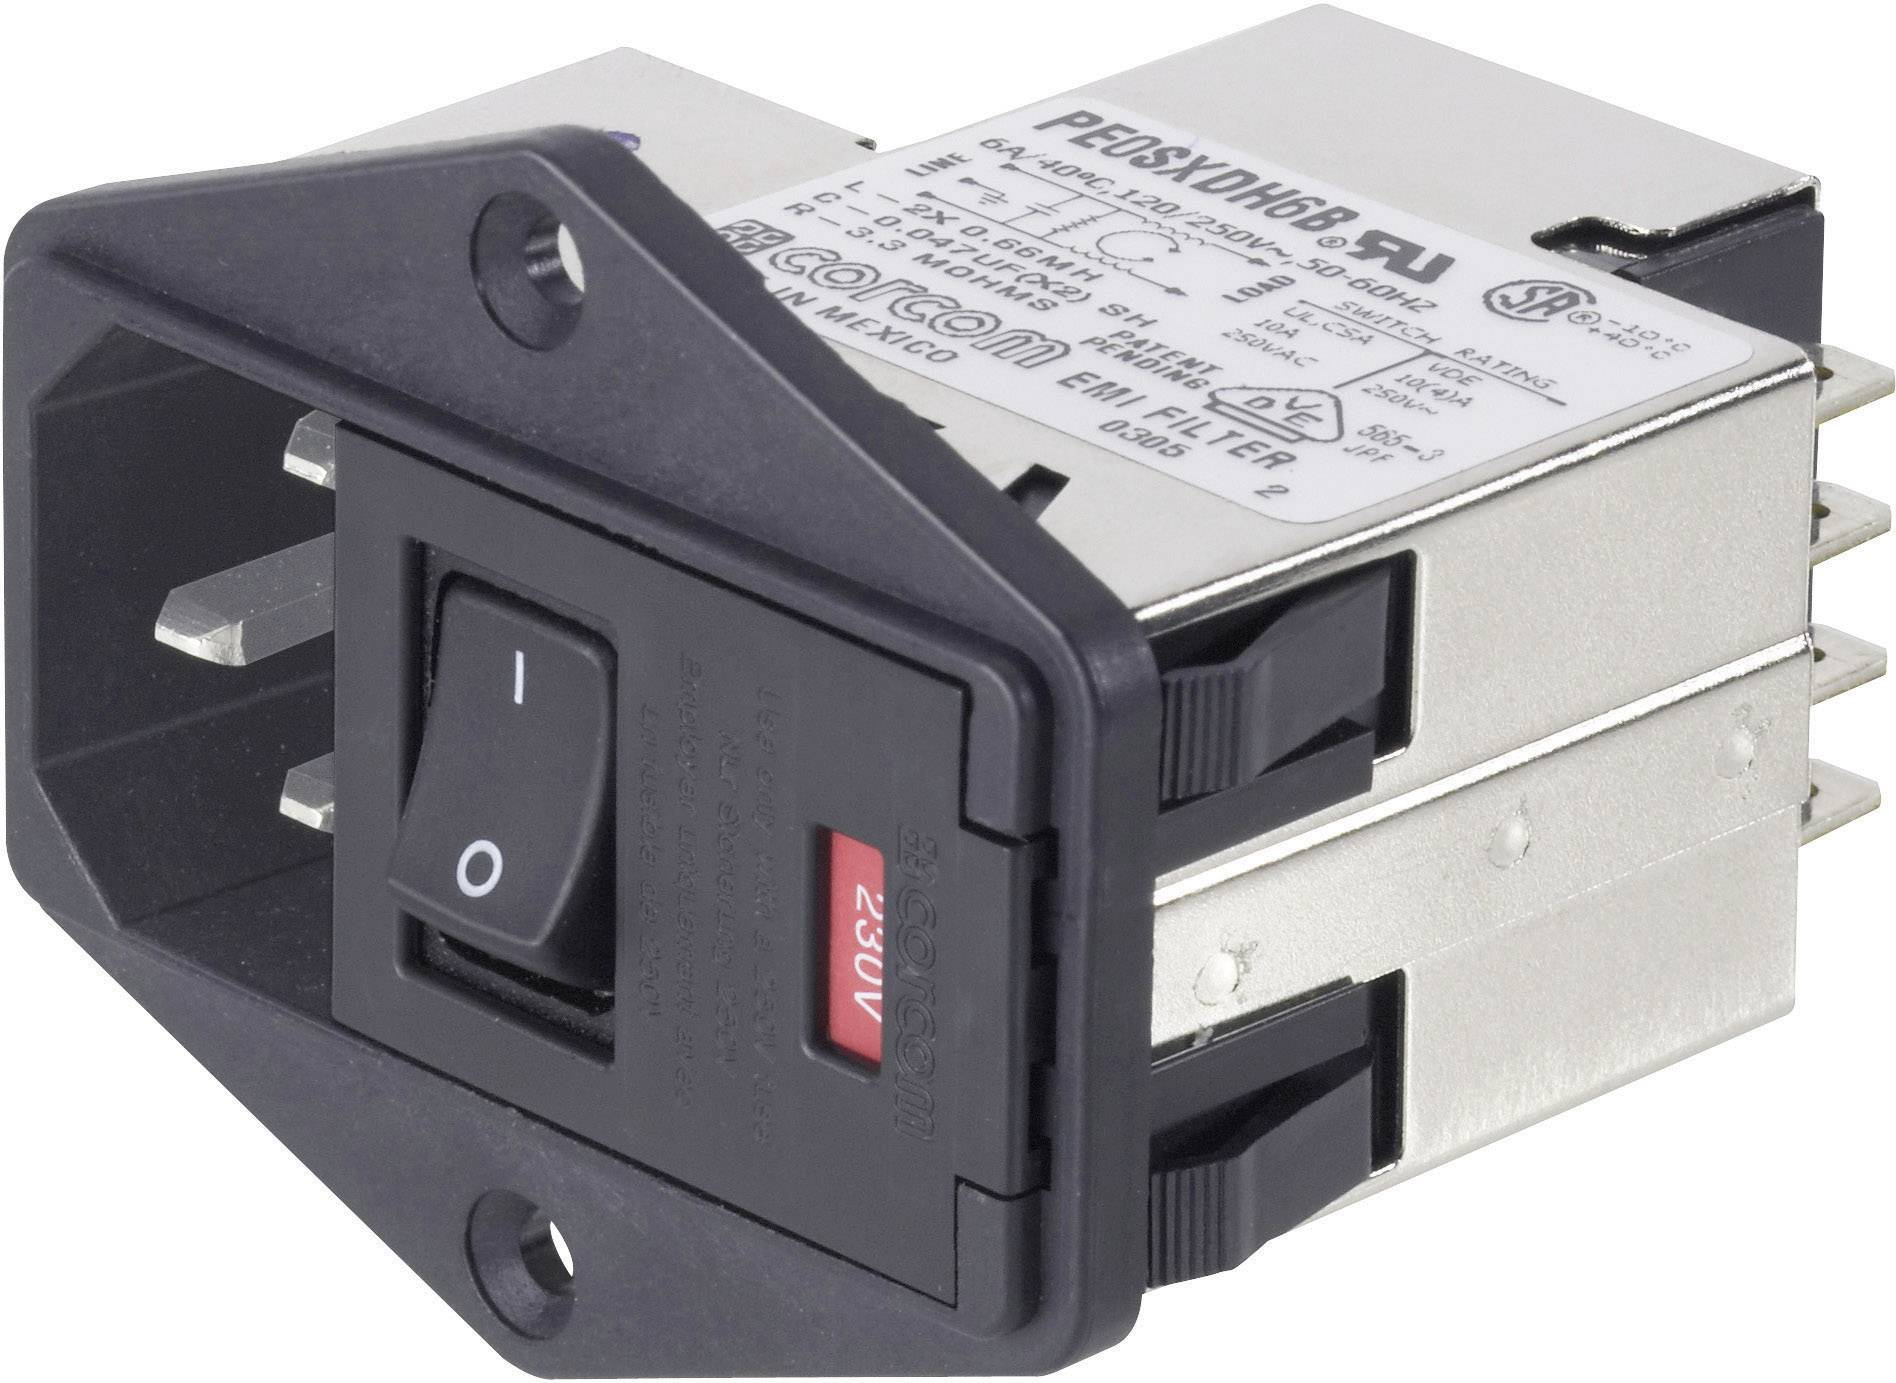 Síťový filtr TE Connectivity, PS0S0DS6B=C1185, 250 V/AC, 6 A